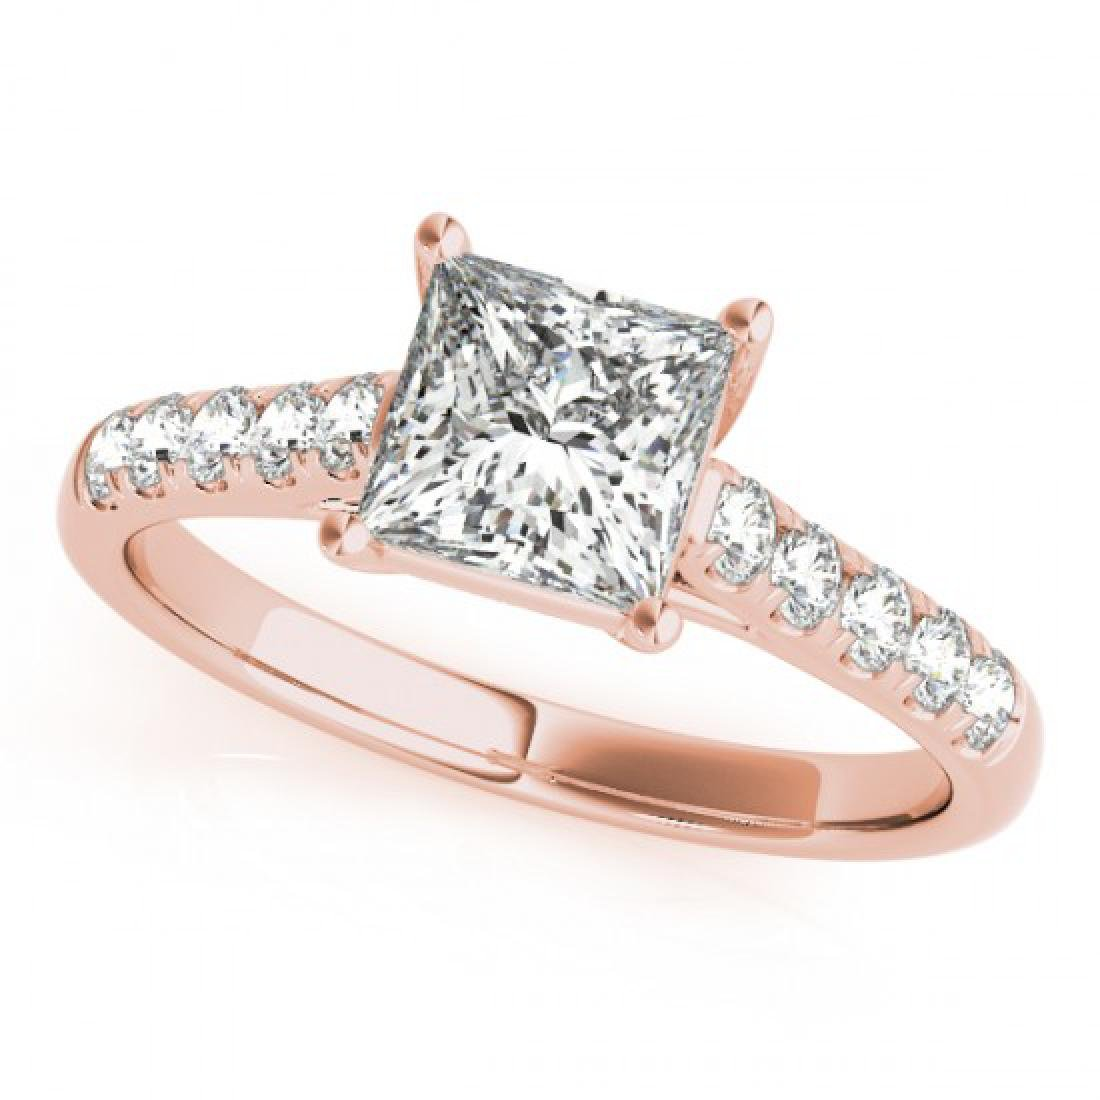 0.85 CTW Certified VS/SI Princess Diamond Ring 14K Rose